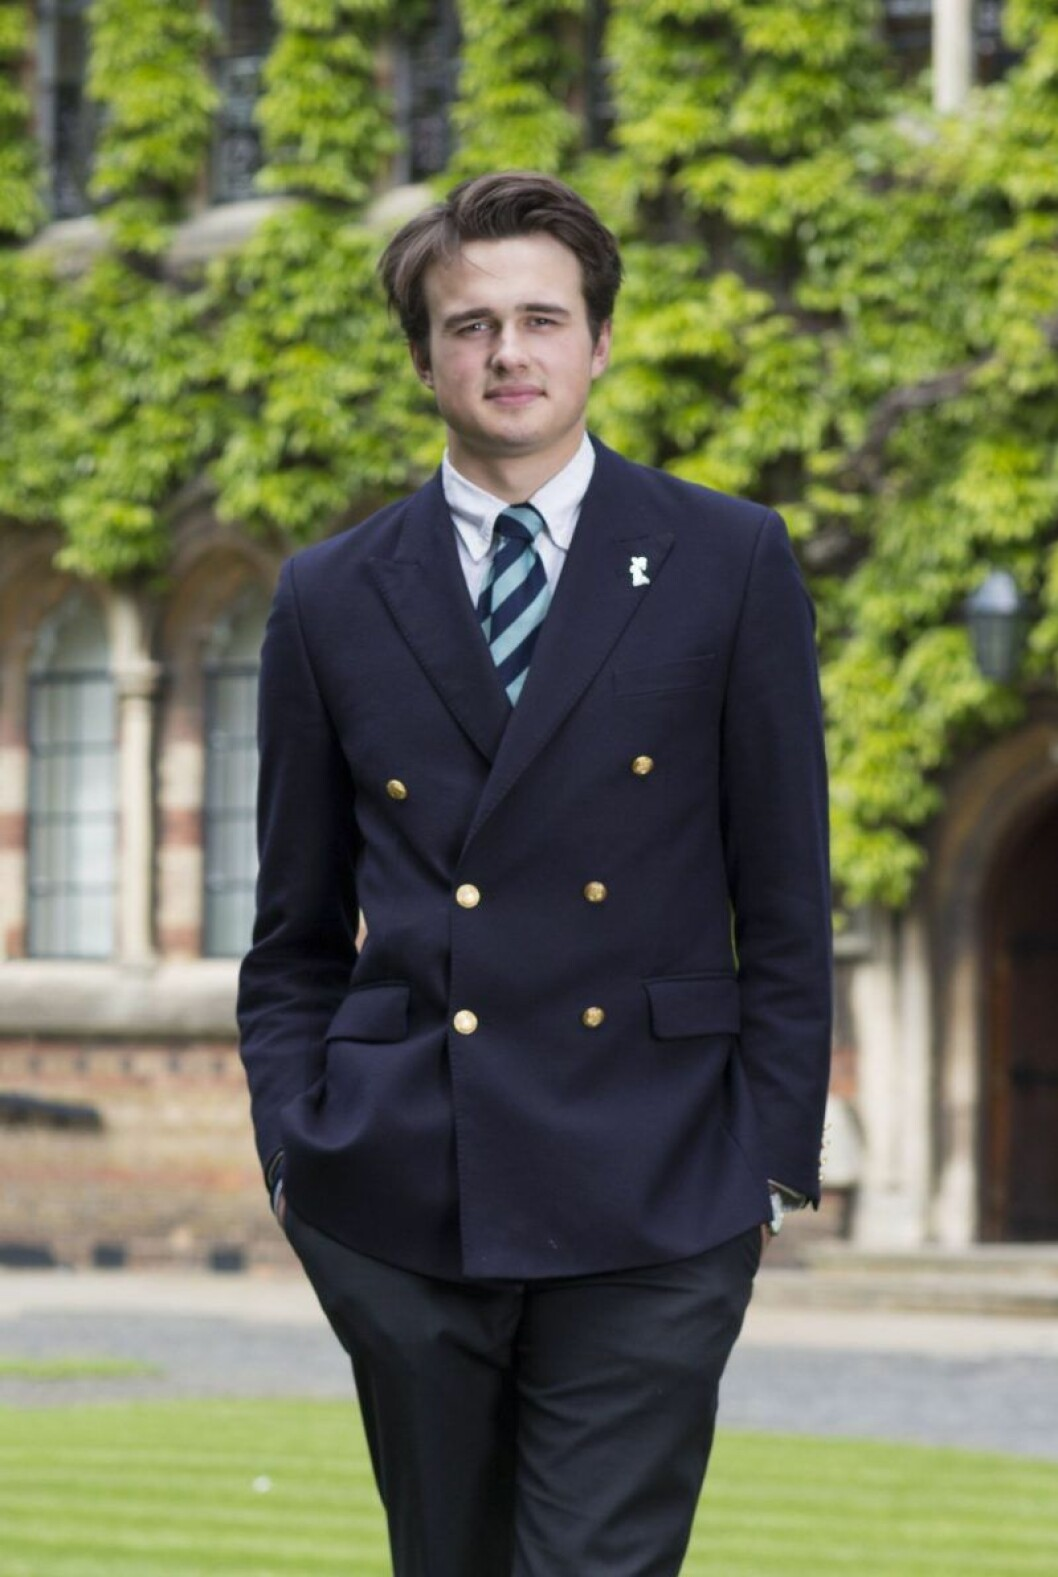 Rory Farquharson står i kostym och slips